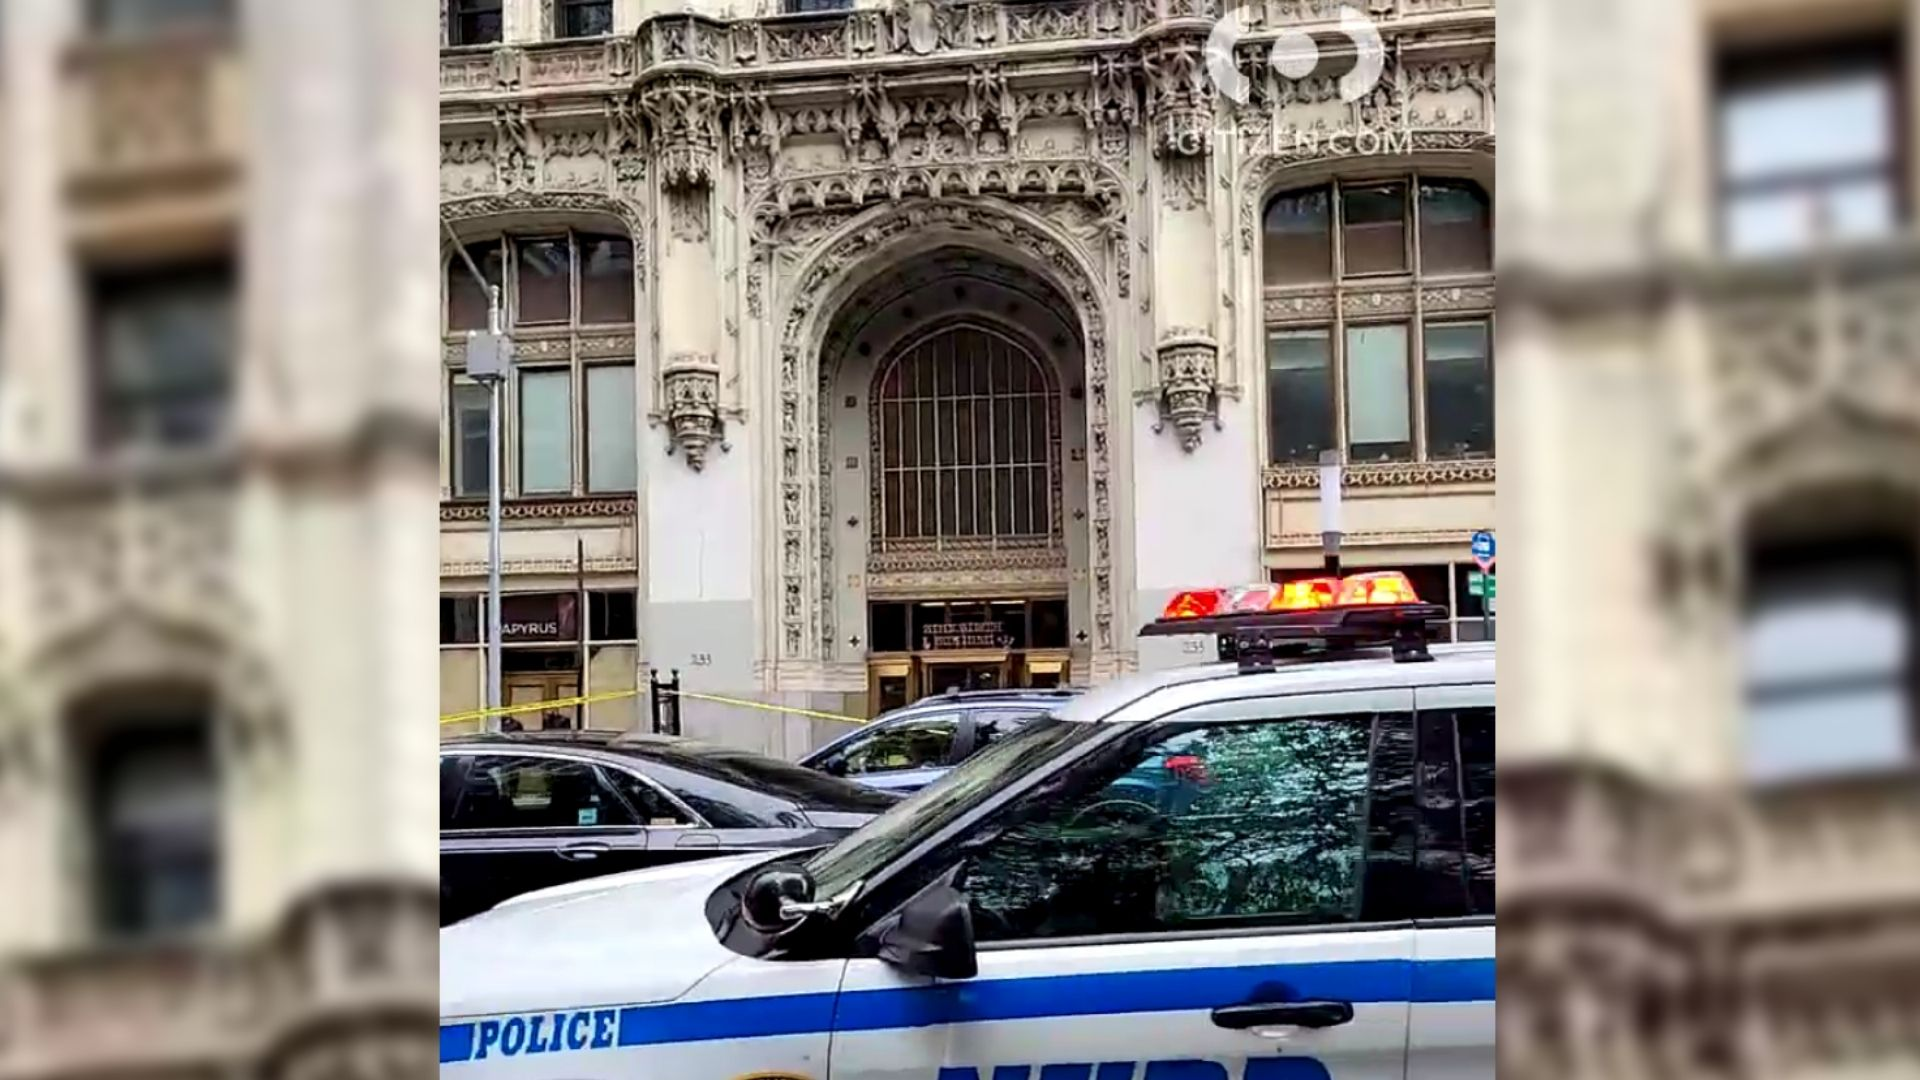 Woolworth Building evacuated